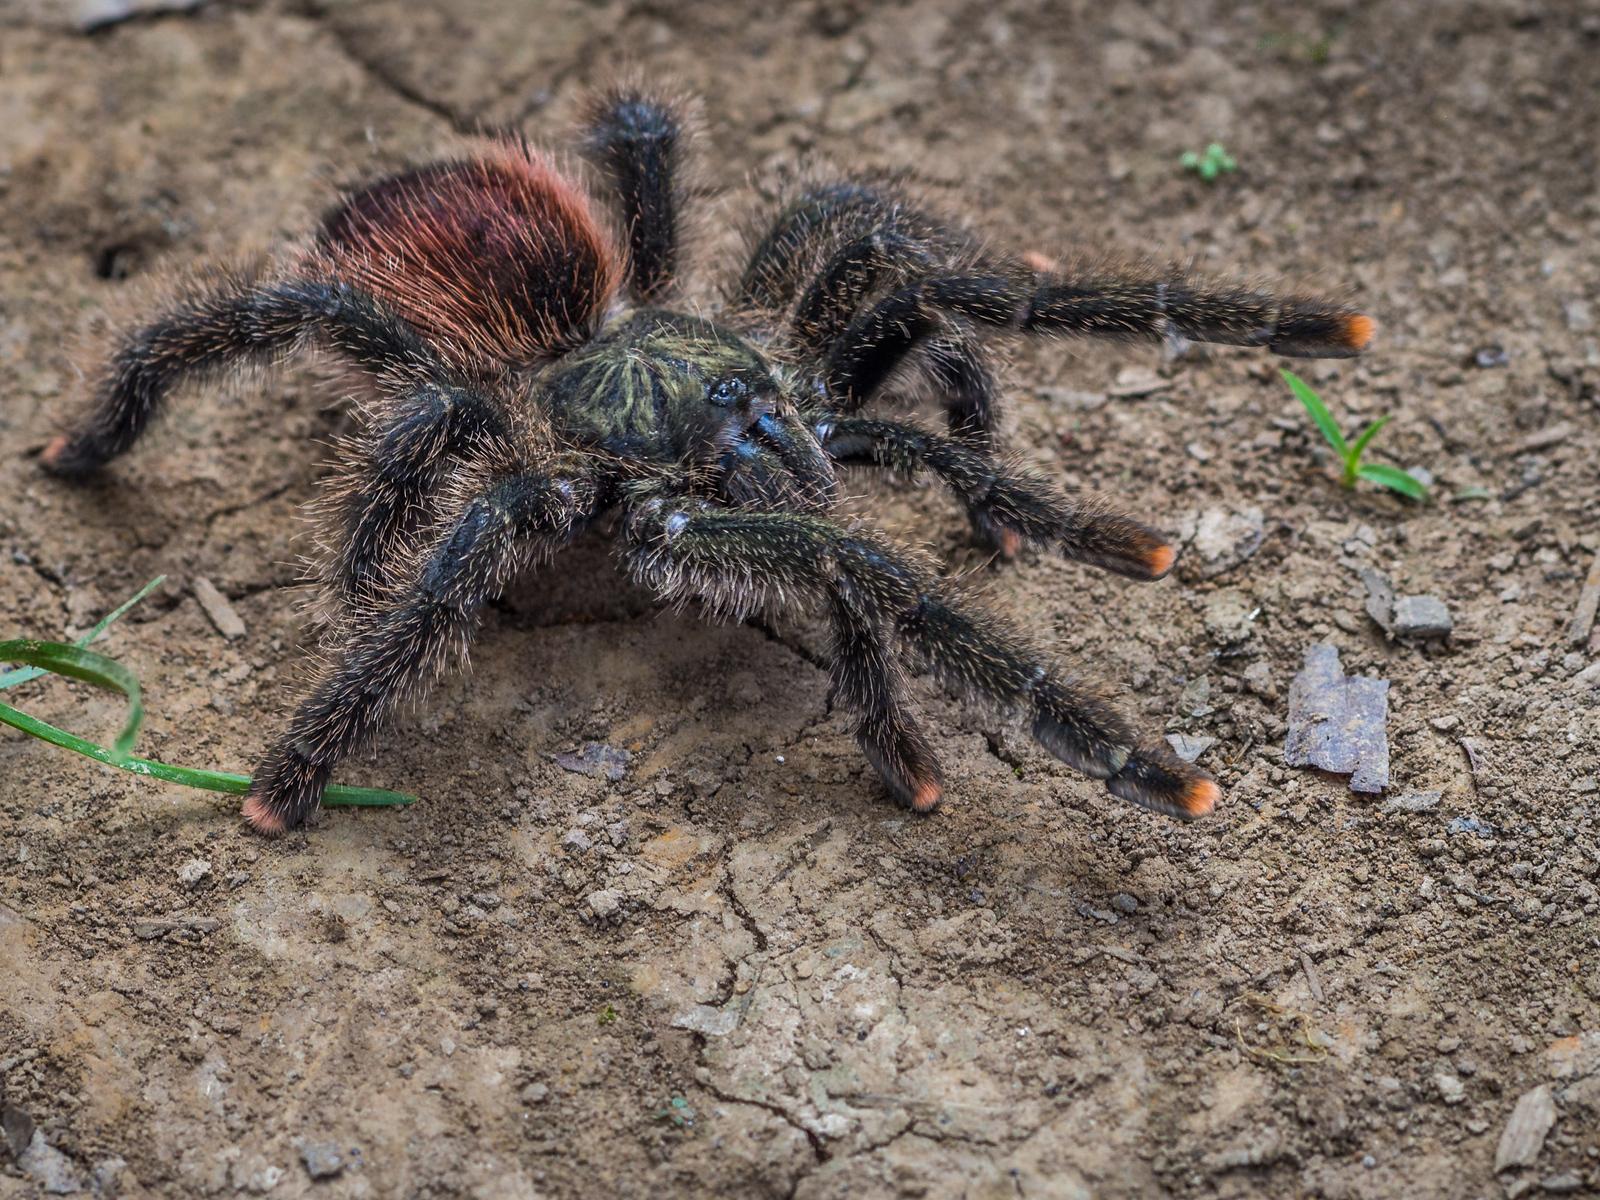 A Tarantula in the Amazon